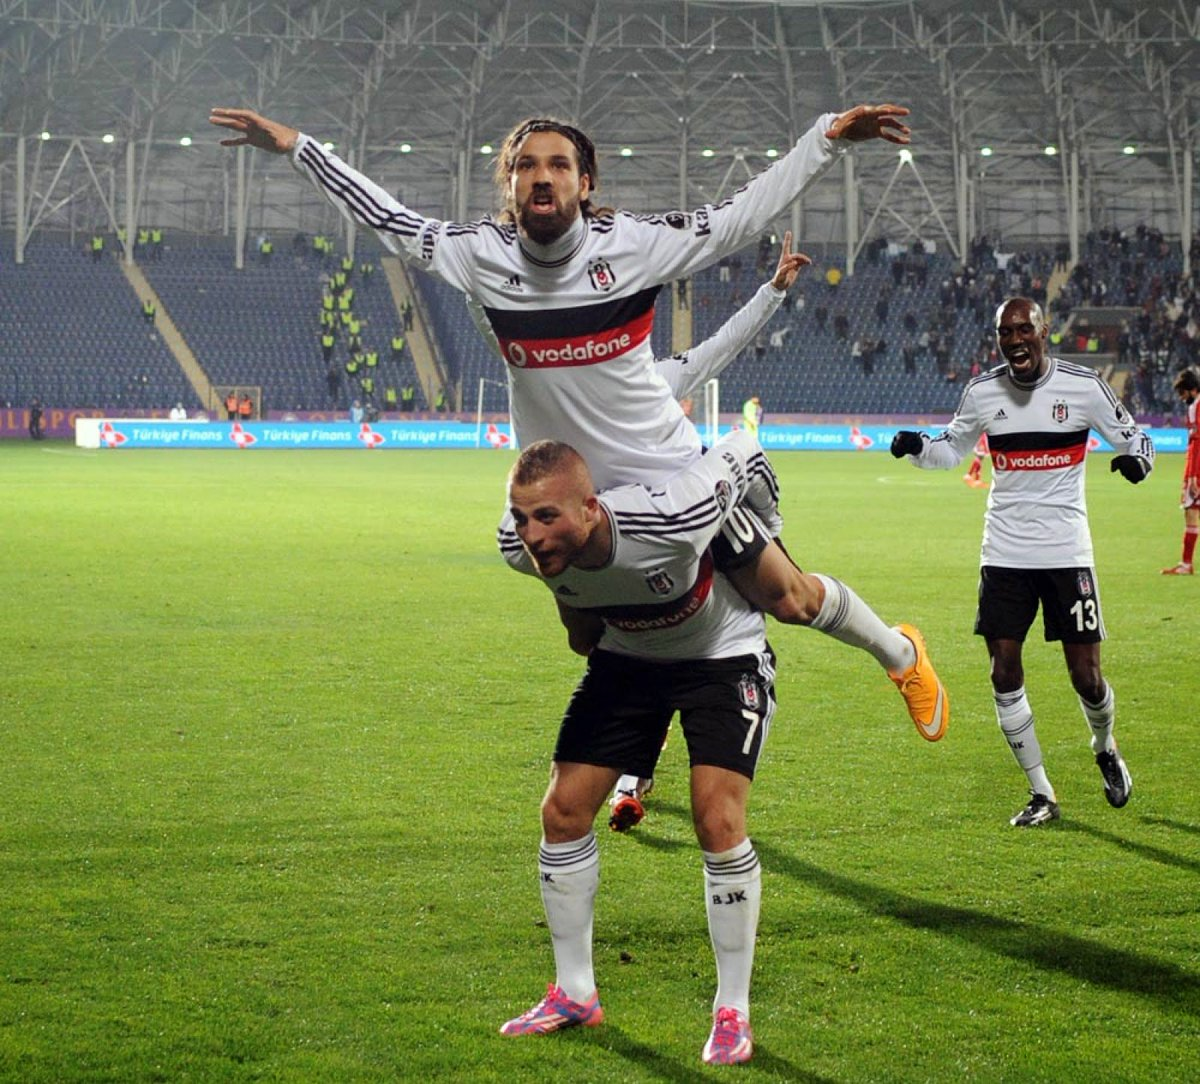 Beşiktaş'ta bir dönem kapandı! https://t.co/xzUGngquji https://t.co/5Z...